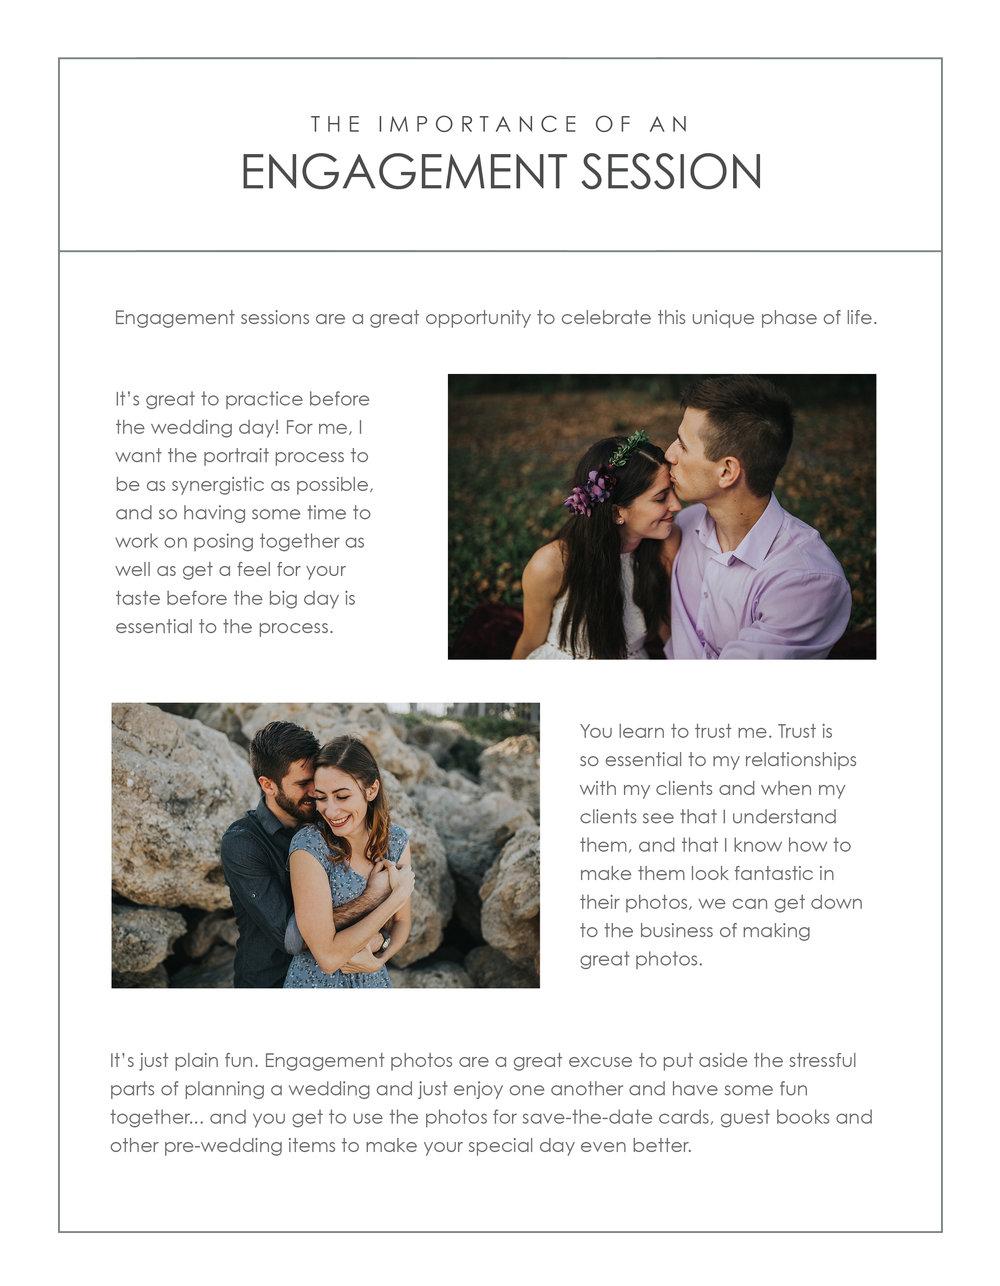 6-EngagementSession.jpg